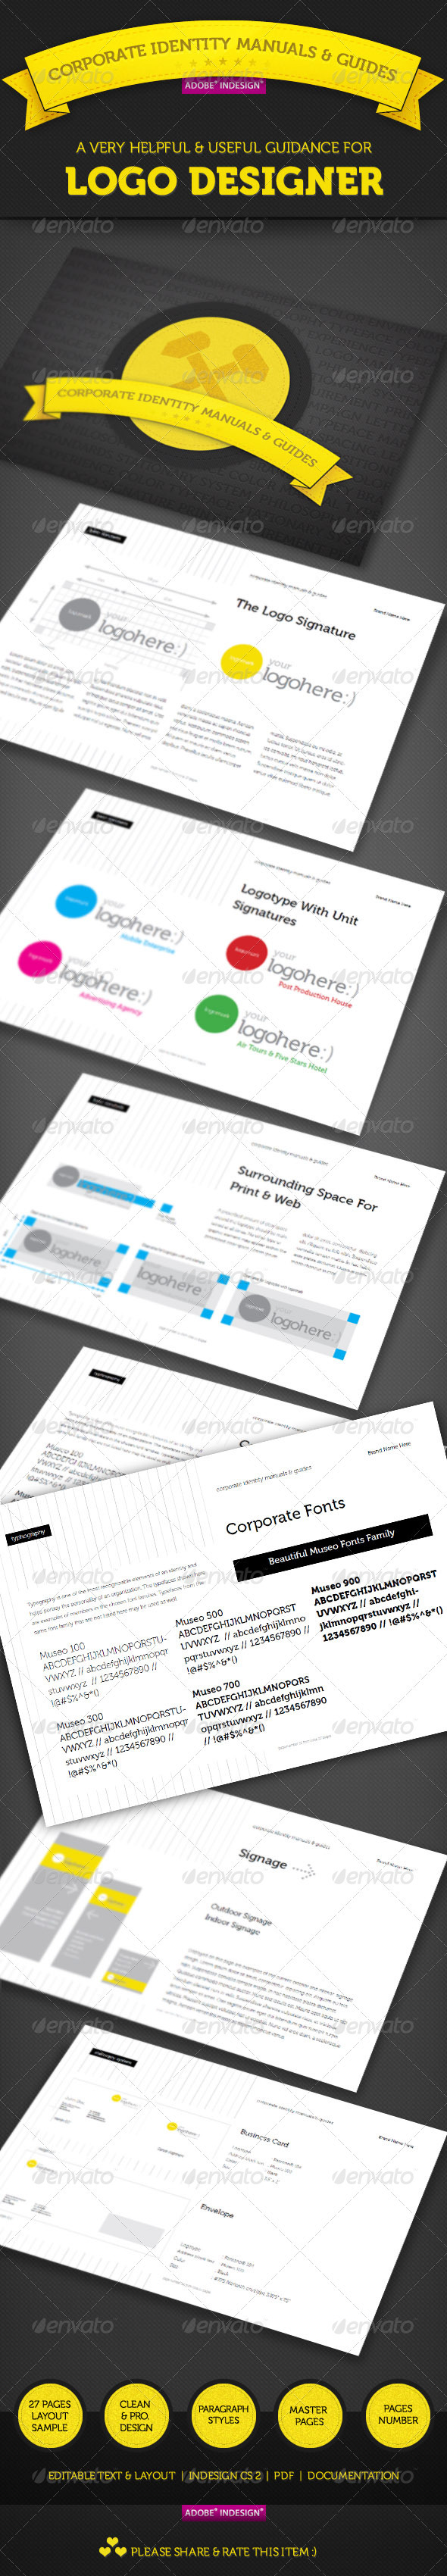 Pragmatic Corporate Identity Manual Guide